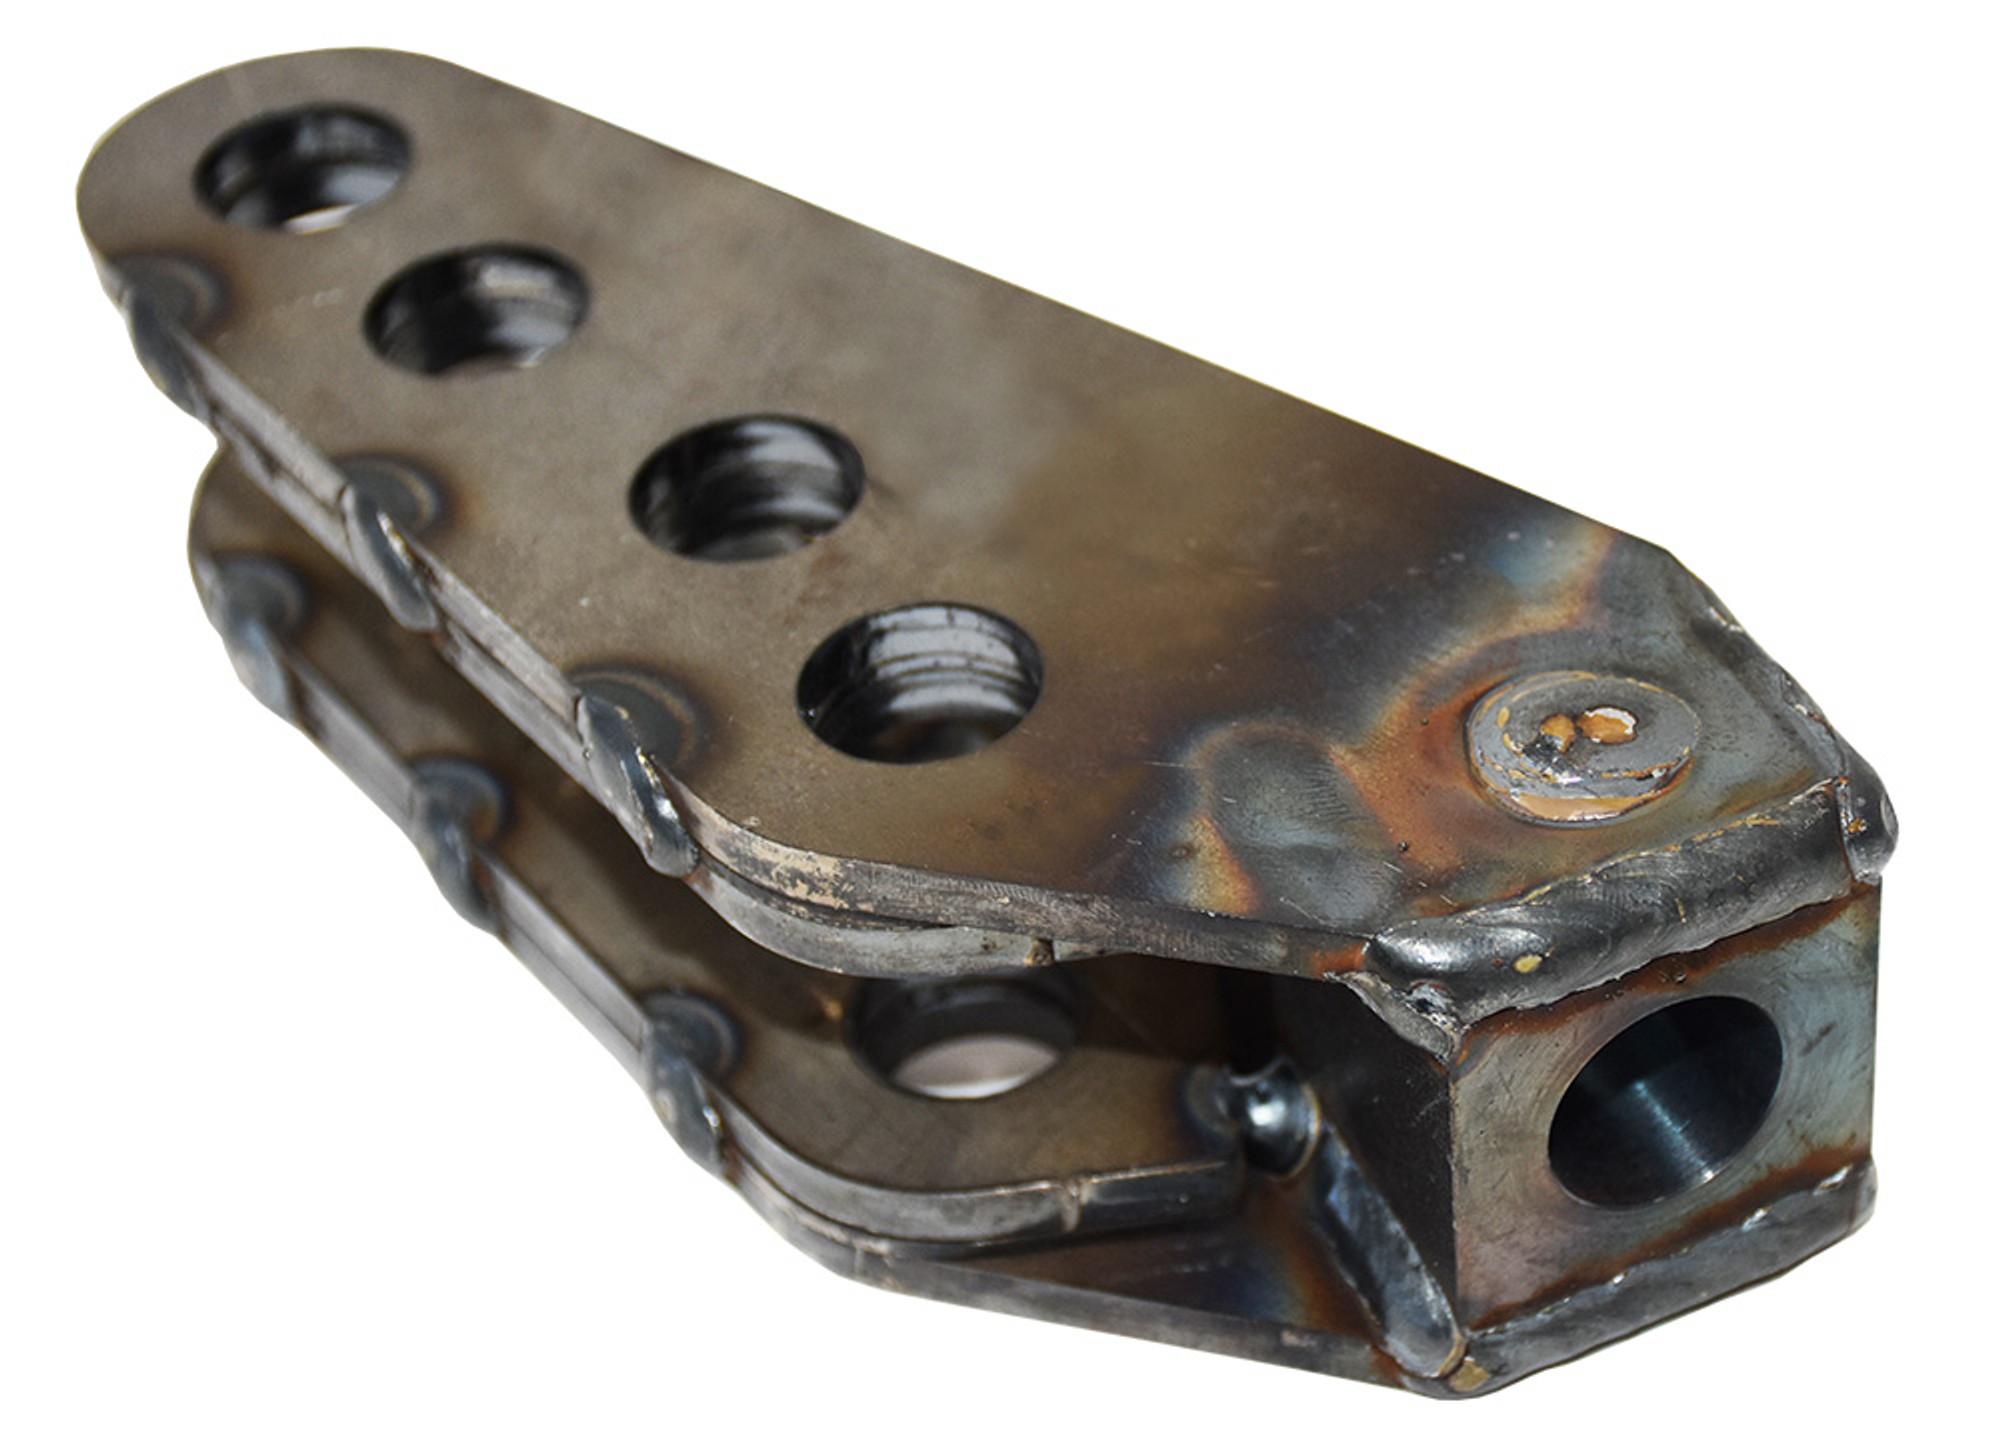 PERMASEAL JE012 EXHAUST FLANGE GASKET ID 40mm OD 52mm